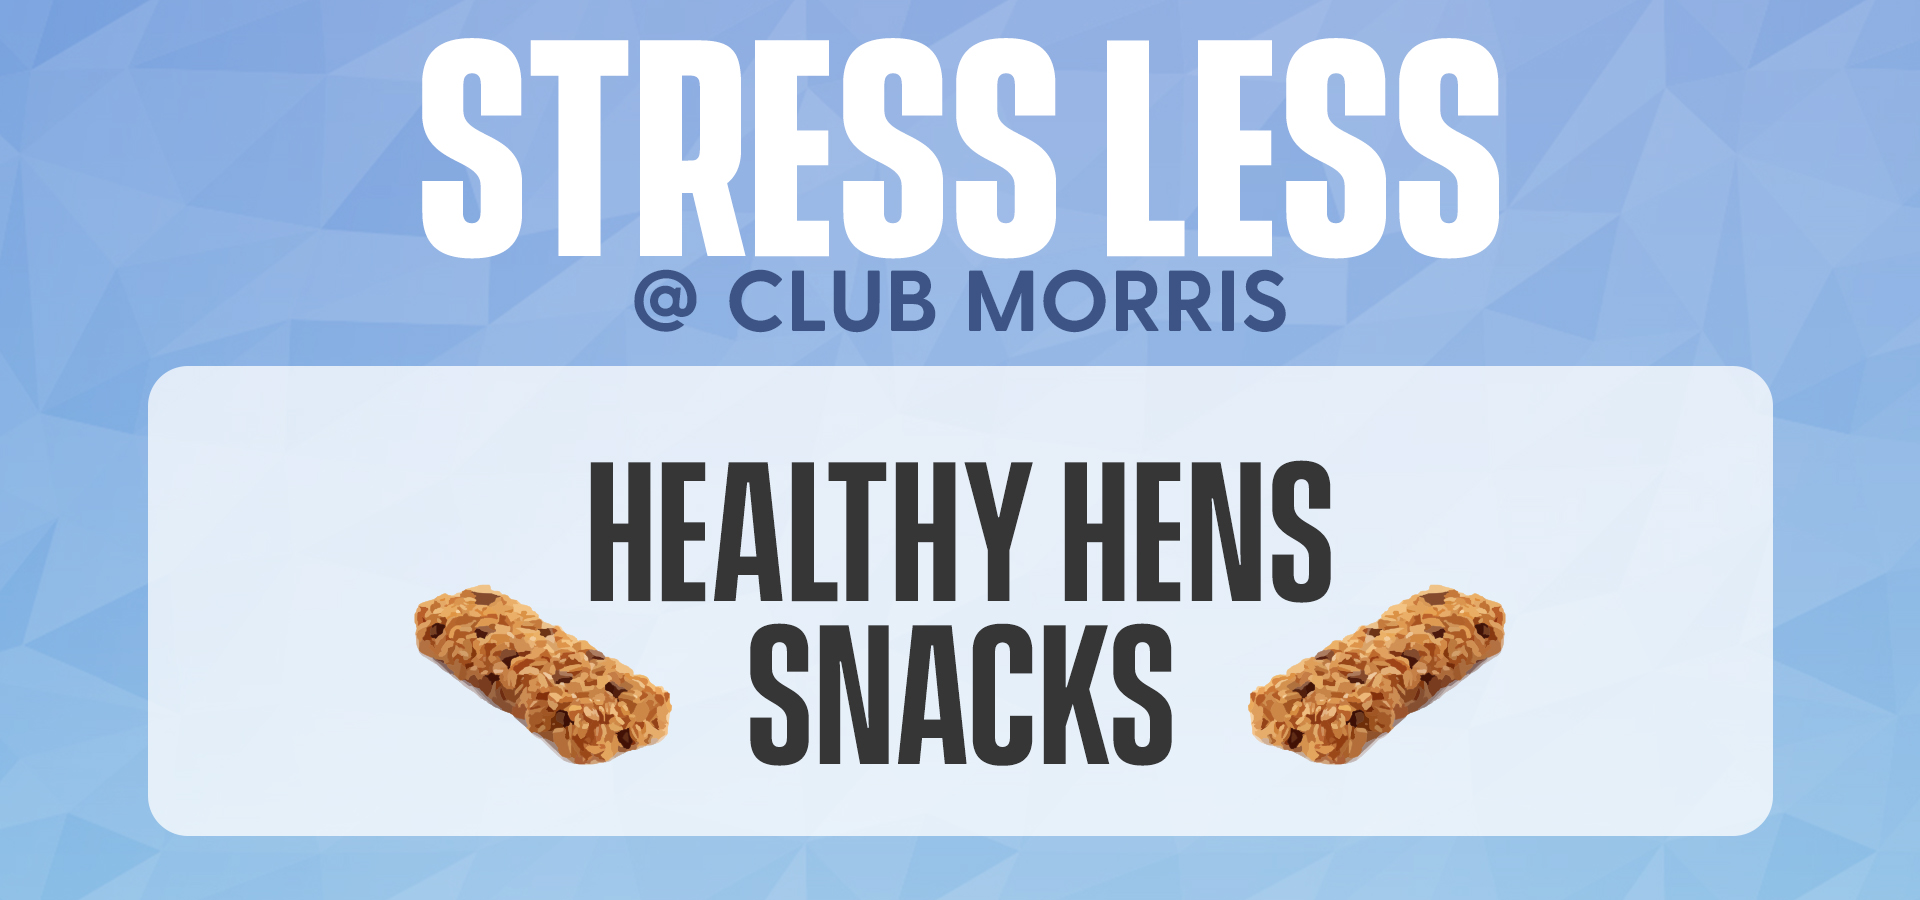 Healthy Hens Snacks